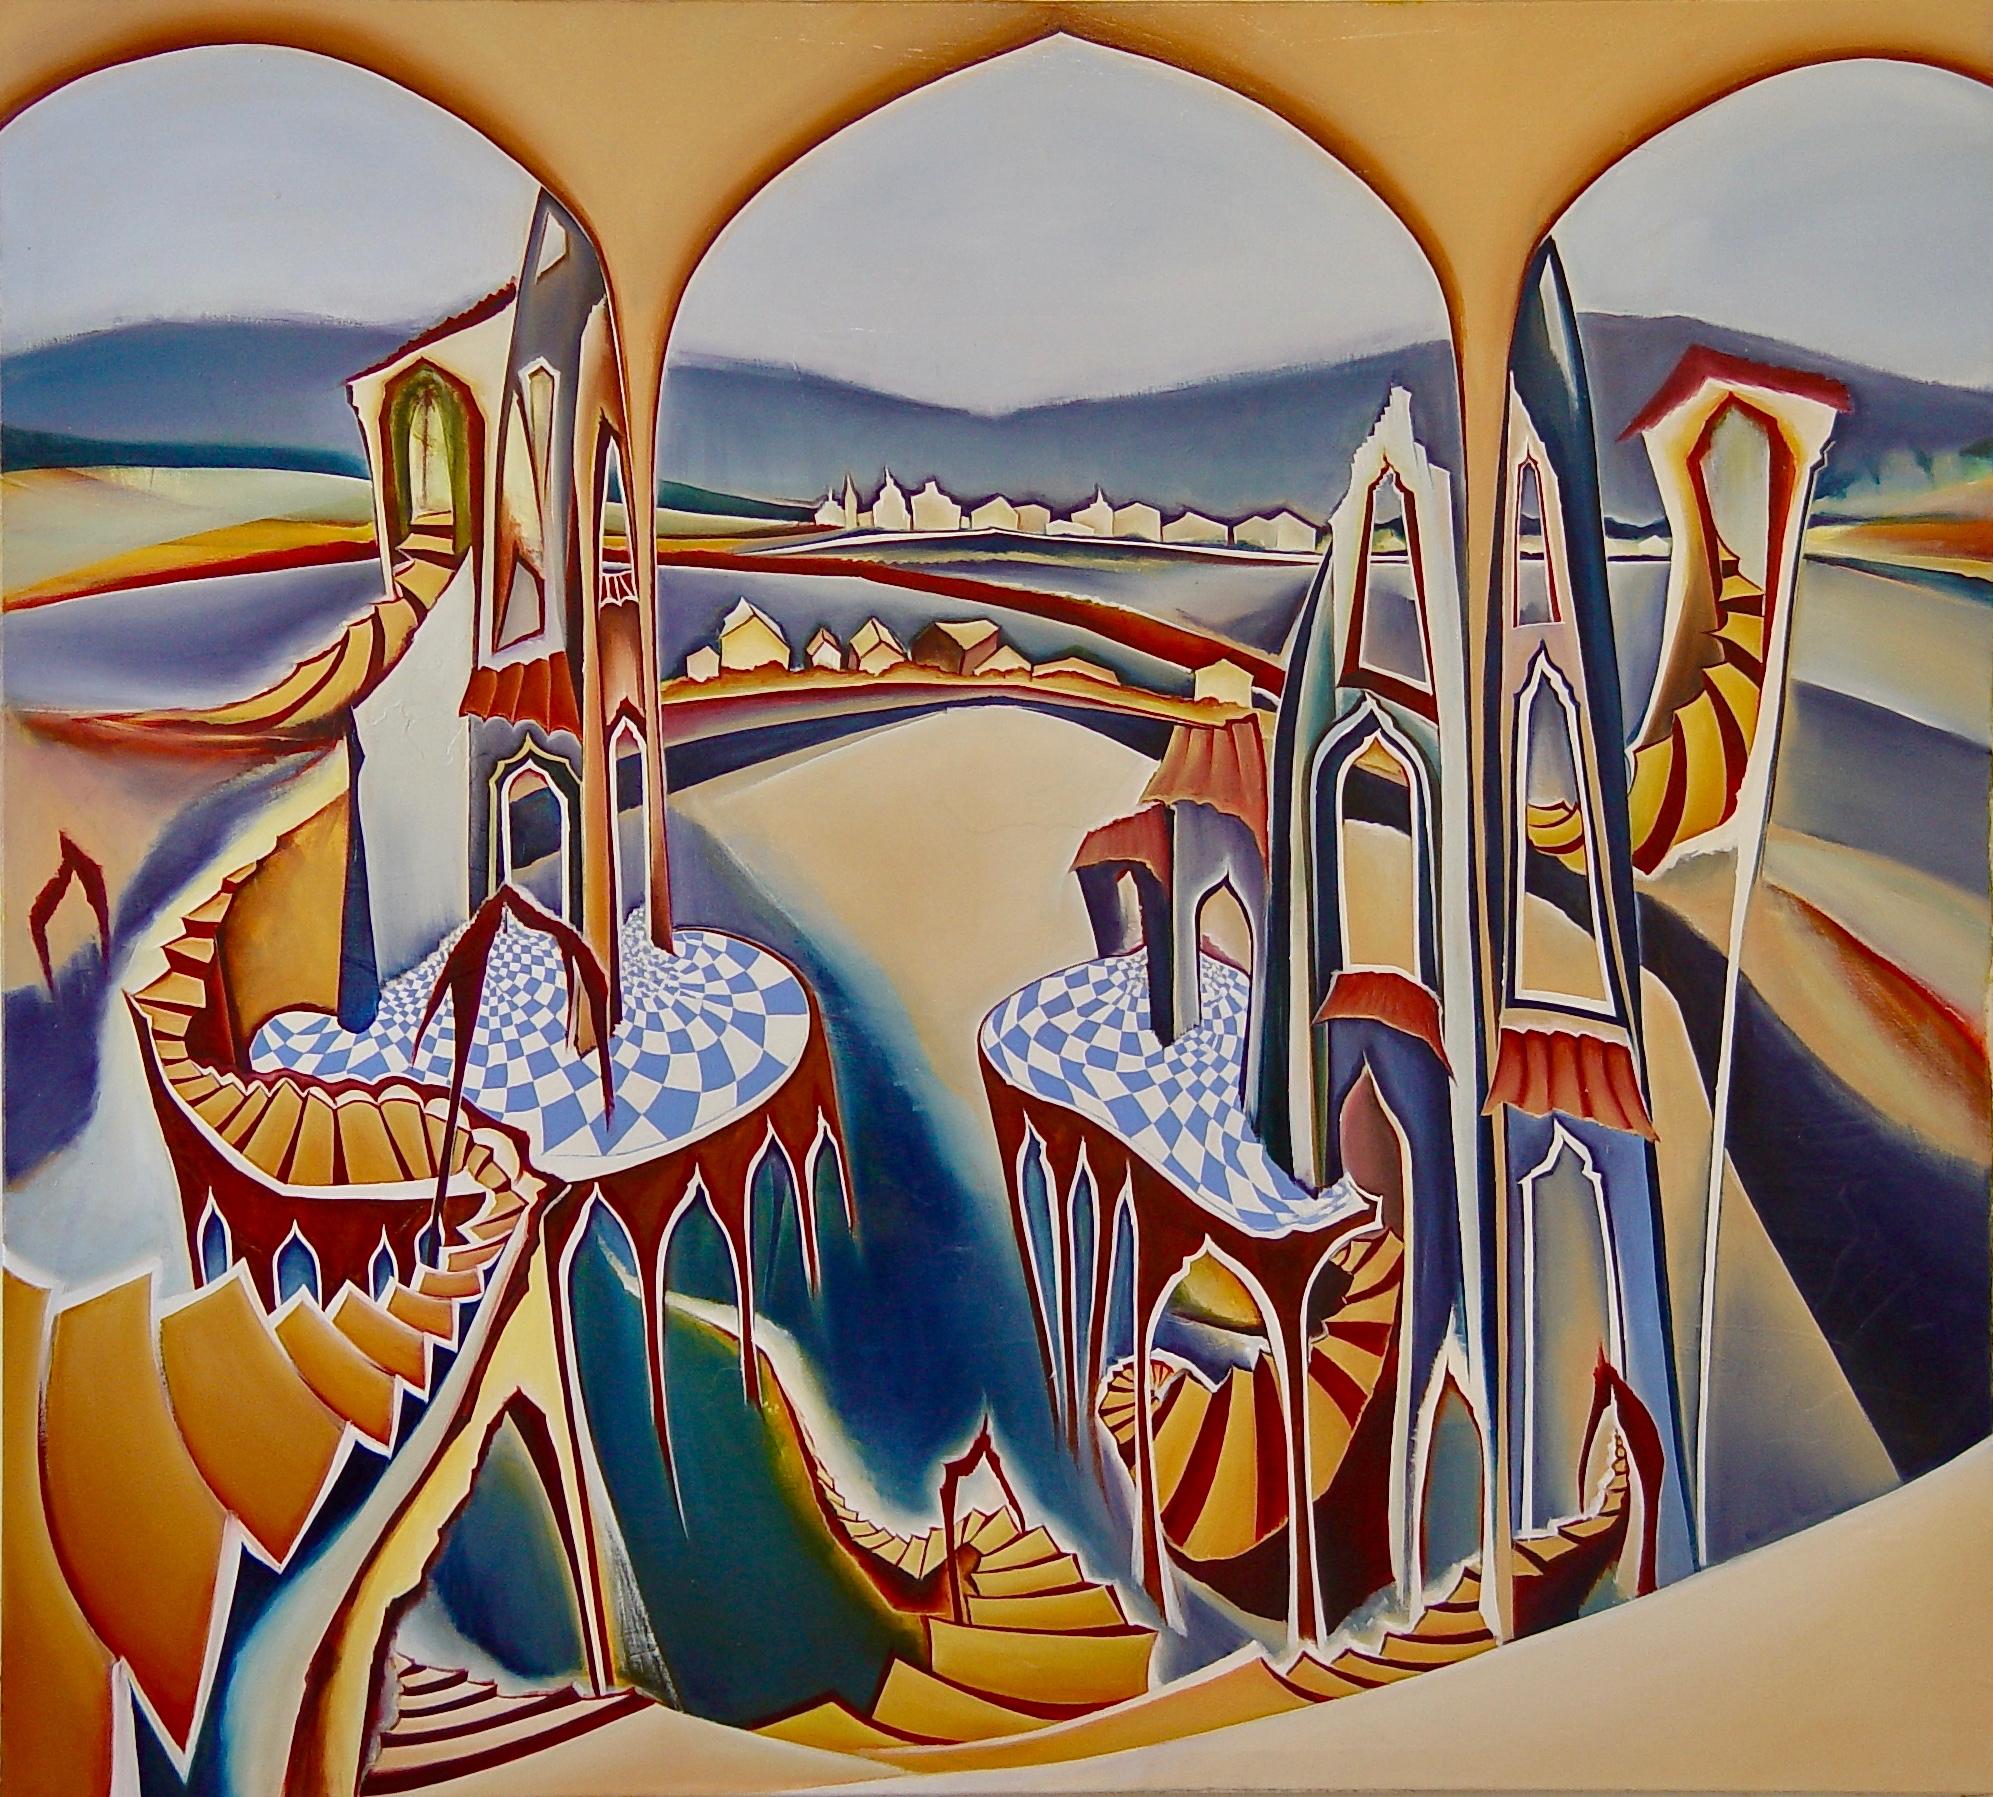 5. Belvedere, Oil on canvas,180 x 200 cm.jpg